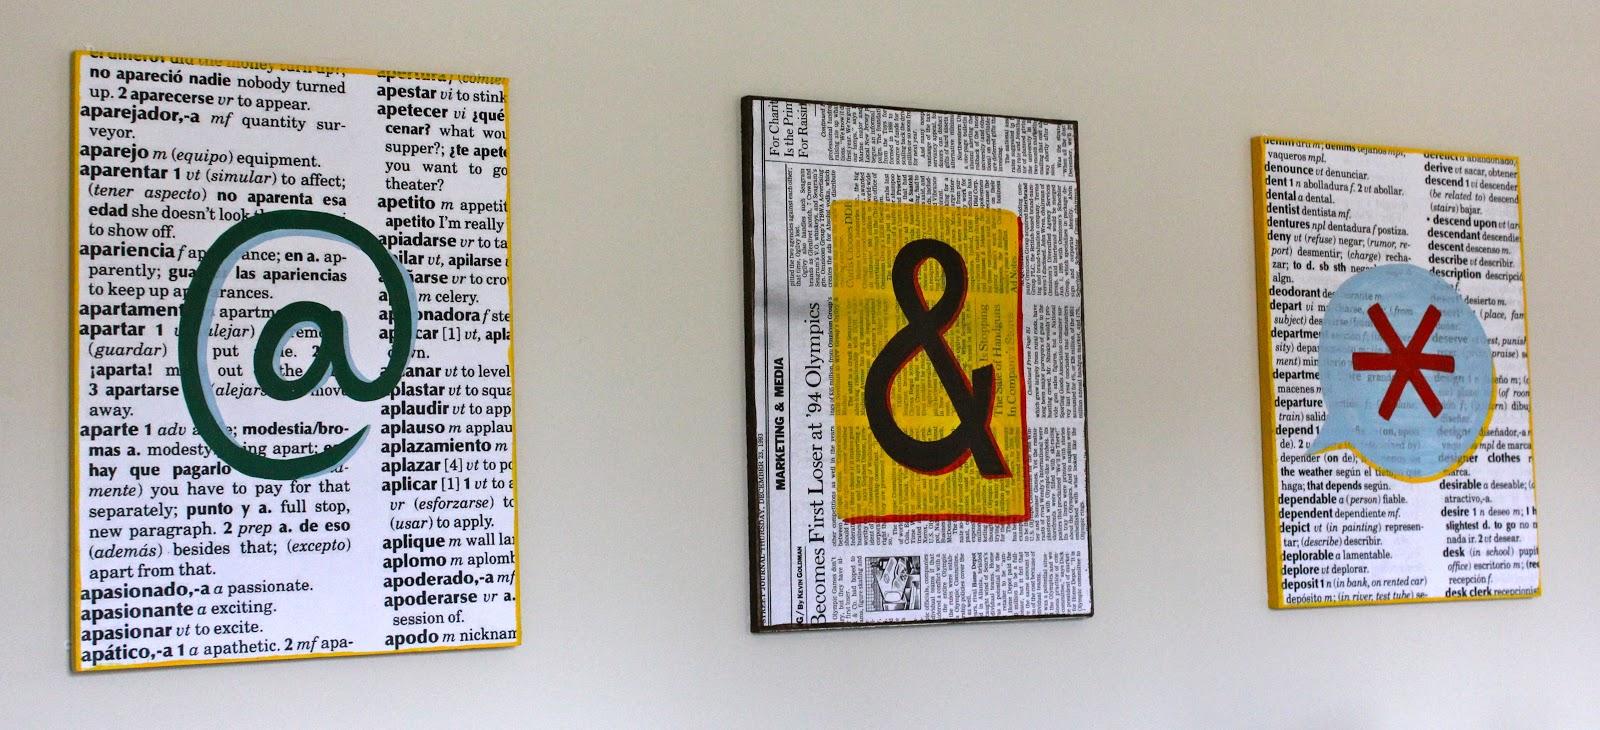 project city indianapolis edition super cheap diy pop art. Black Bedroom Furniture Sets. Home Design Ideas